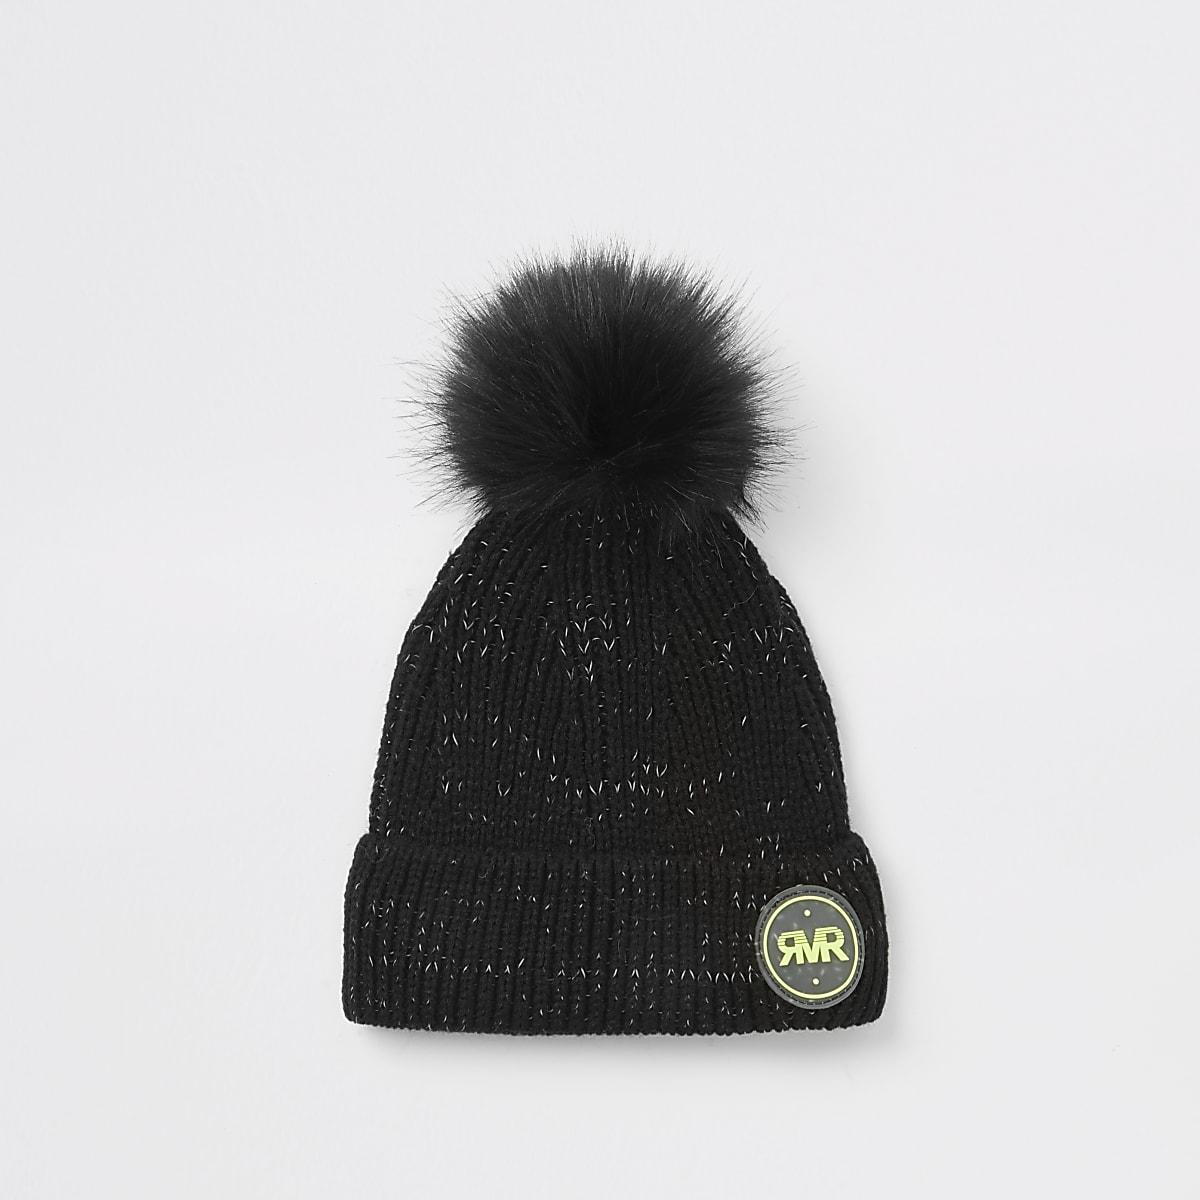 Boys black RVR beanie hat